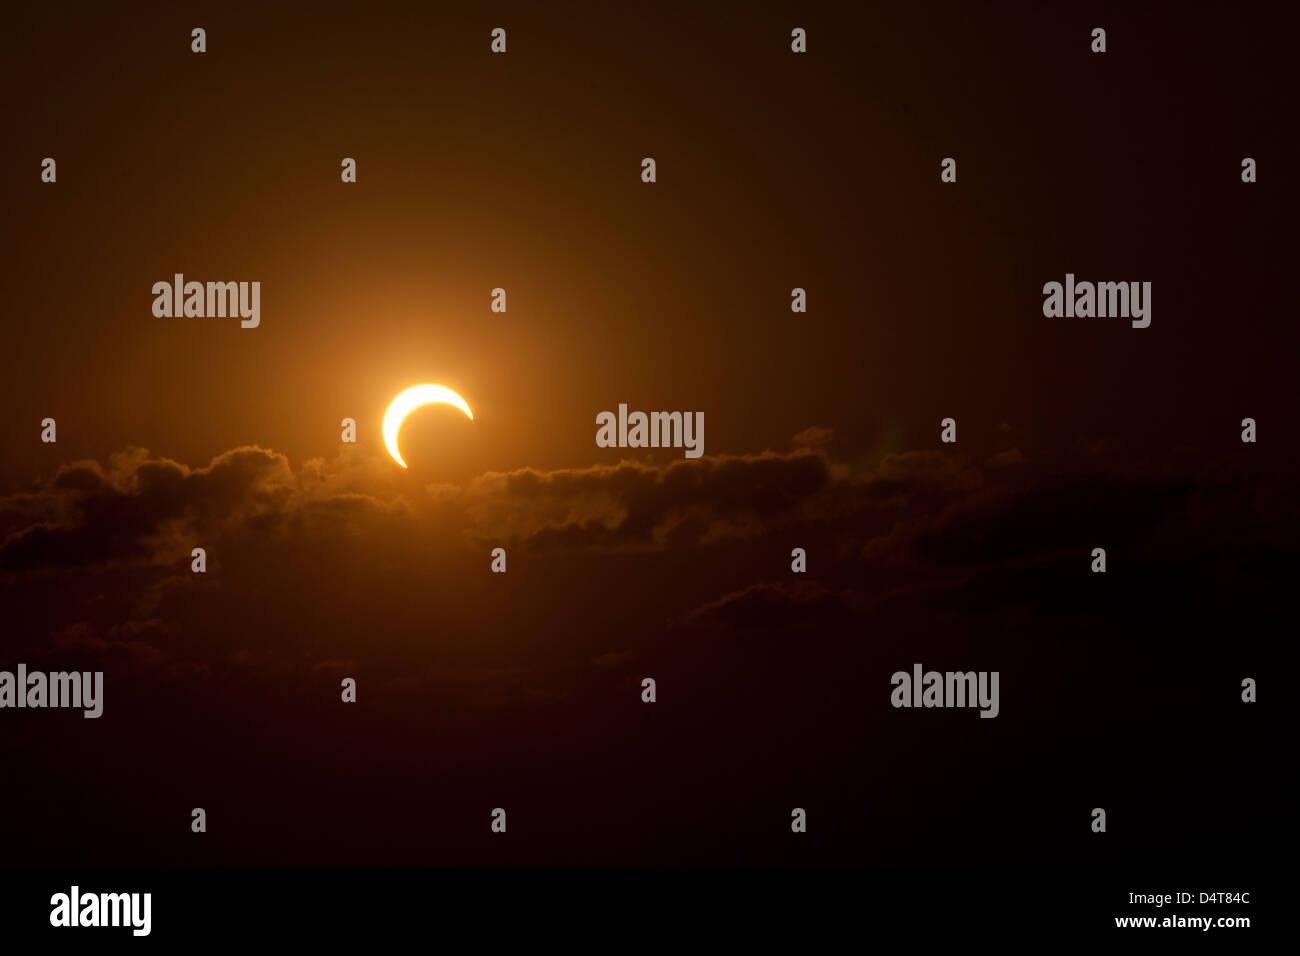 Partielle Sonnenfinsternis des Jahres 2012. Stockbild